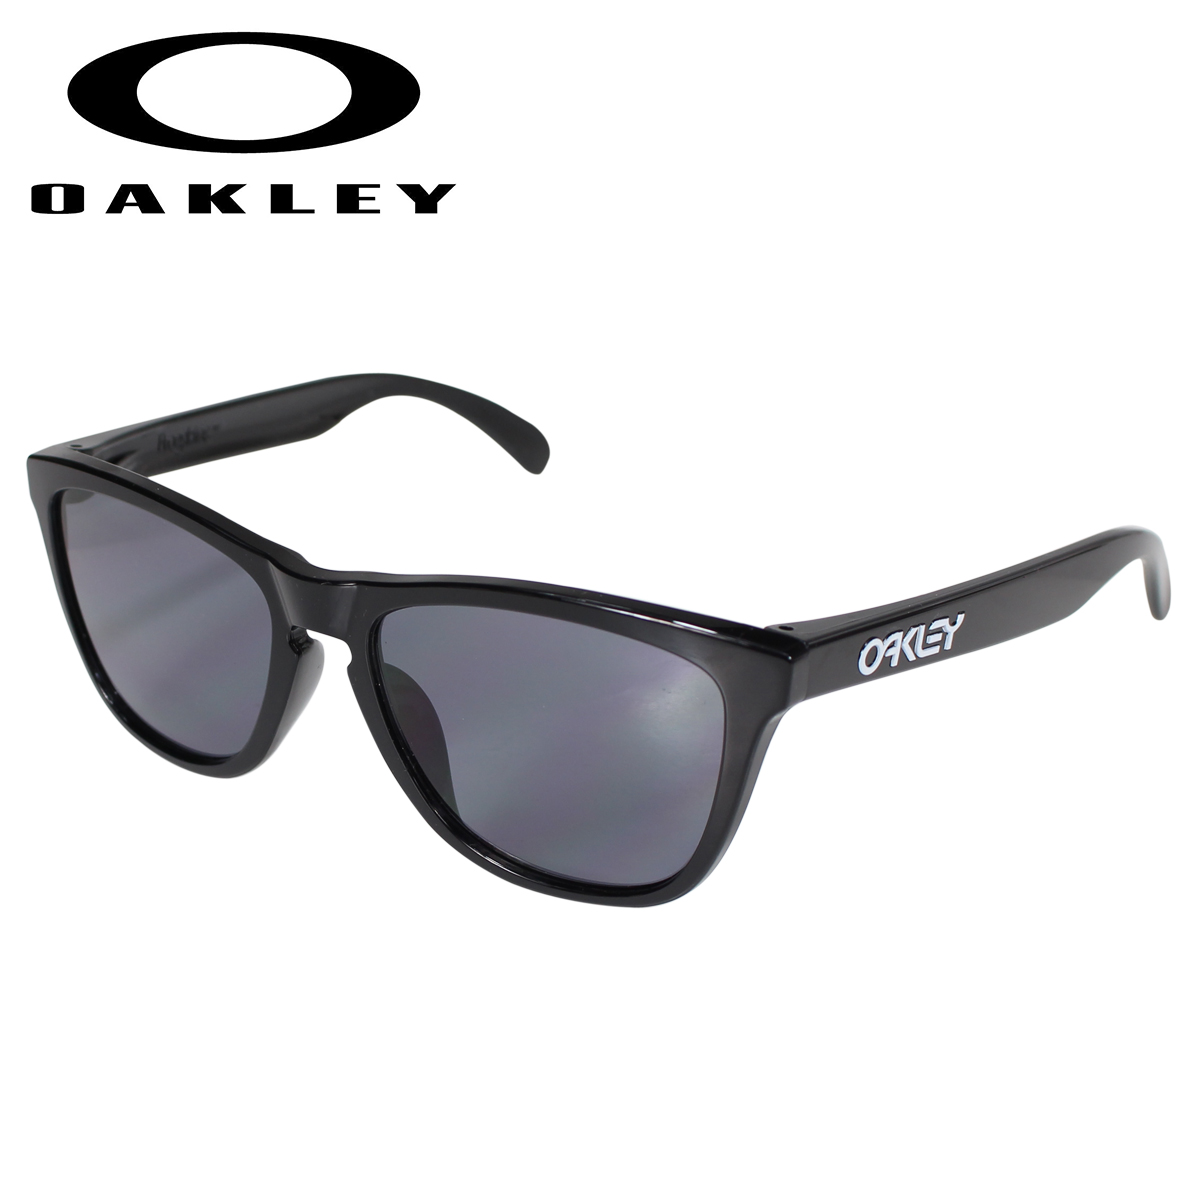 Oakley Frogskins オークリー サングラス フロッグスキン アジアンフィット メンズ レディース ASIAN FIT ブラック OO9245-01